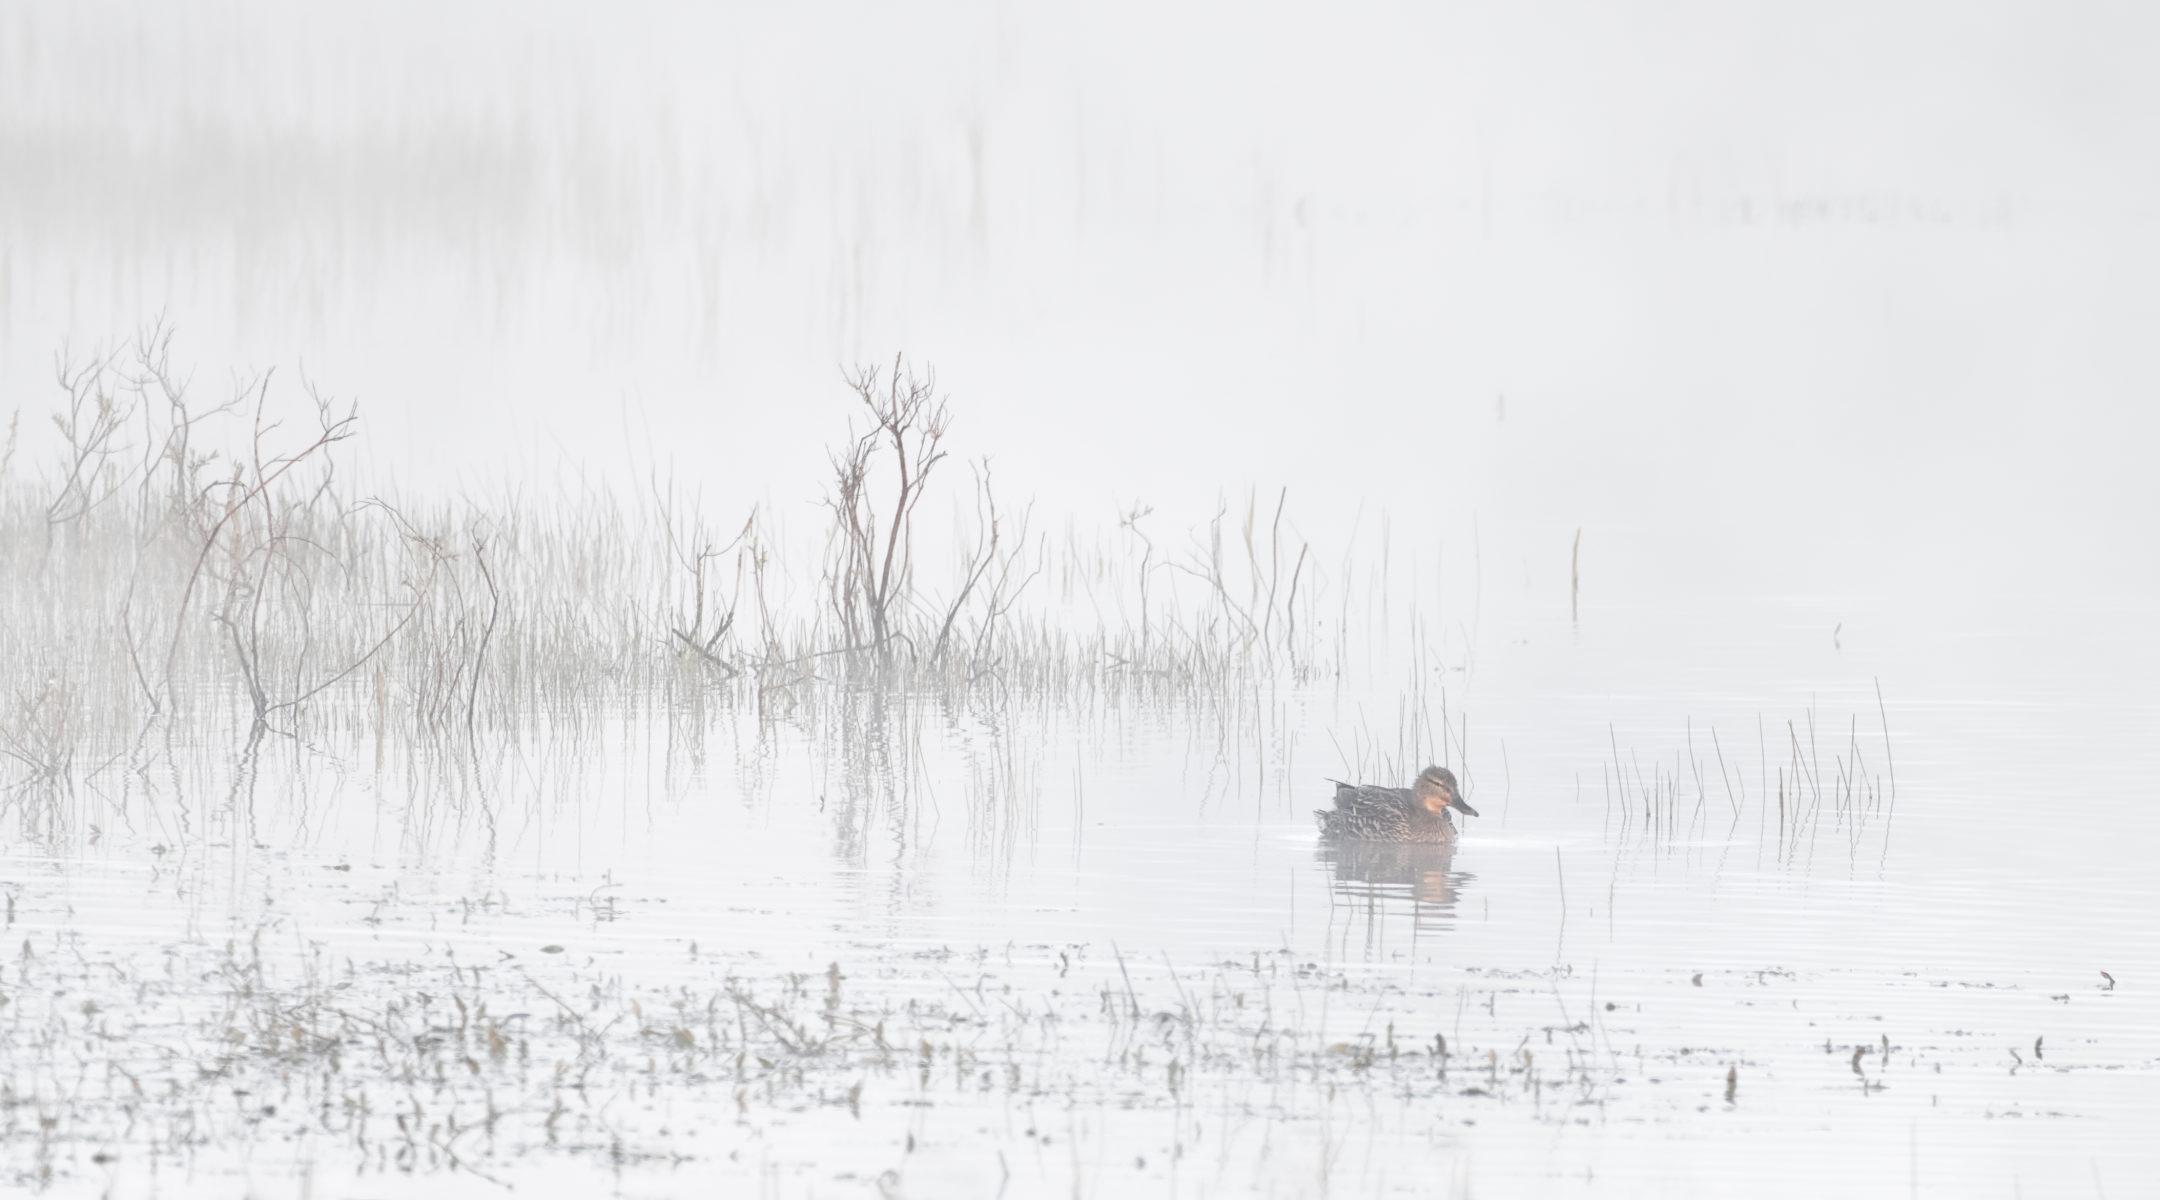 lonely mallard in misty pond